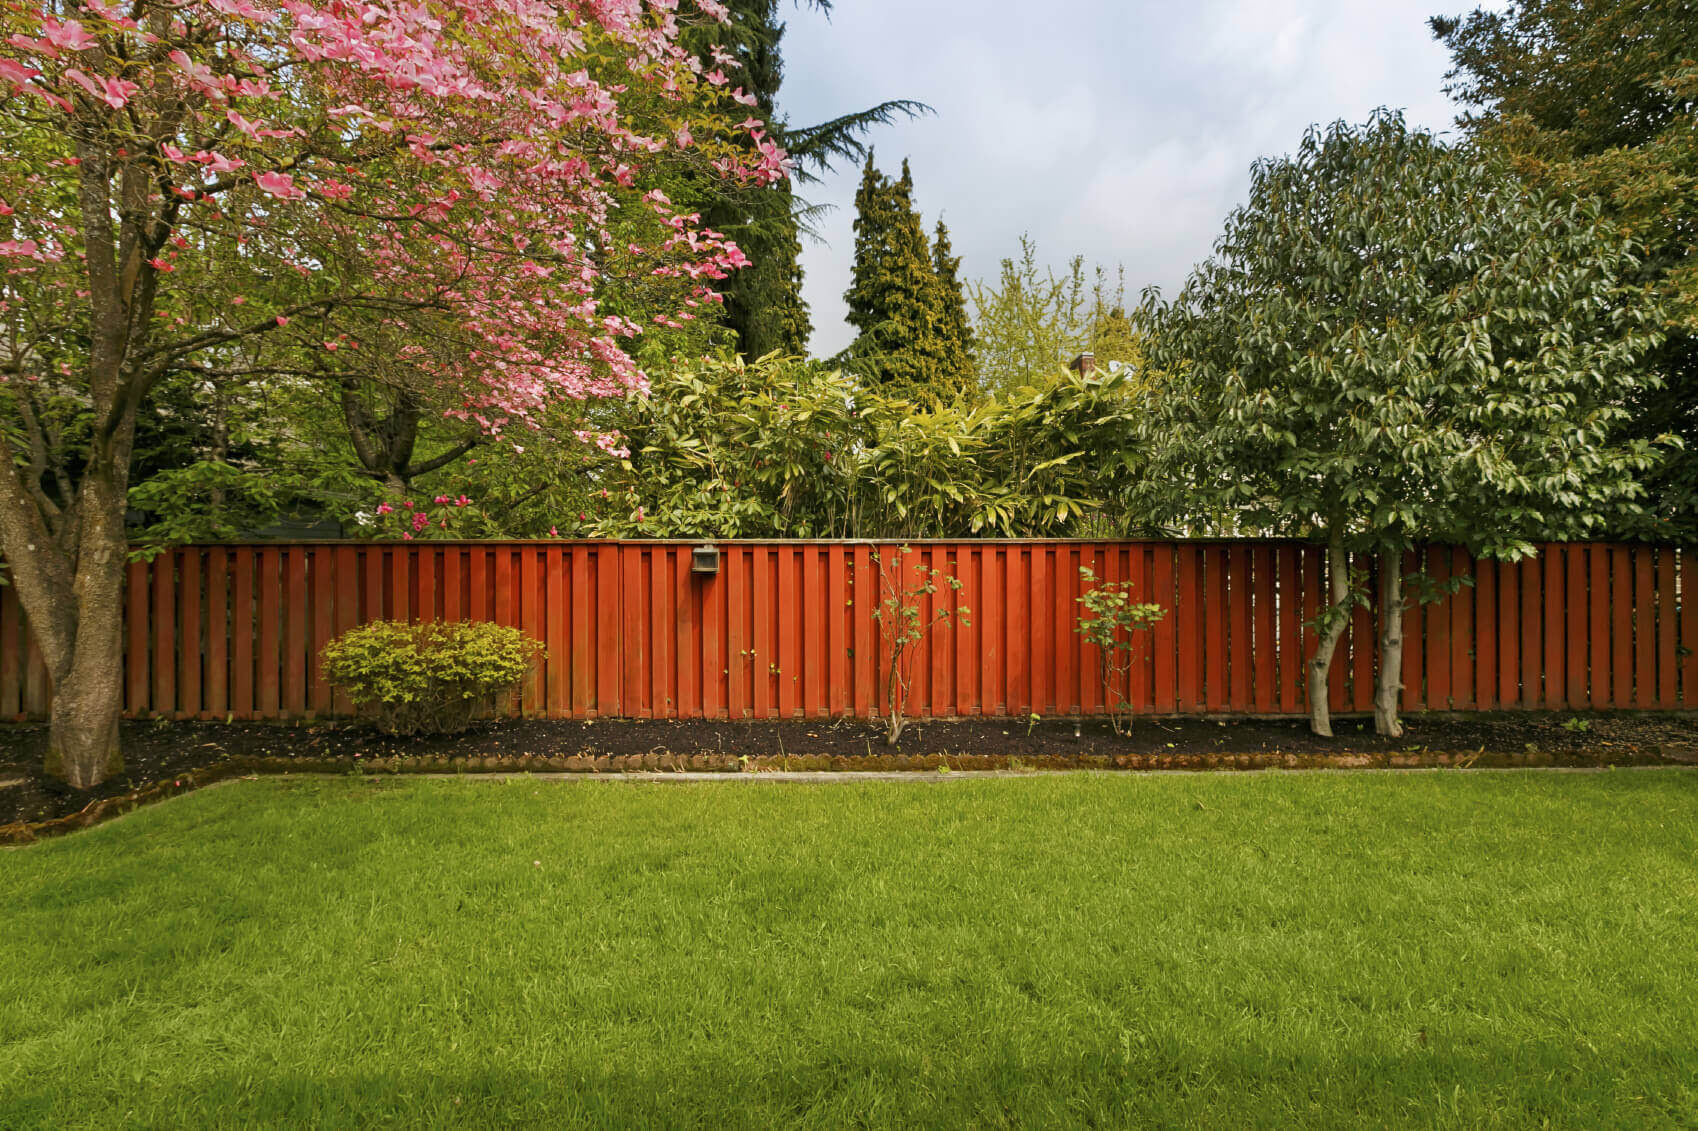 1 Backyard Tree Ideas iStock